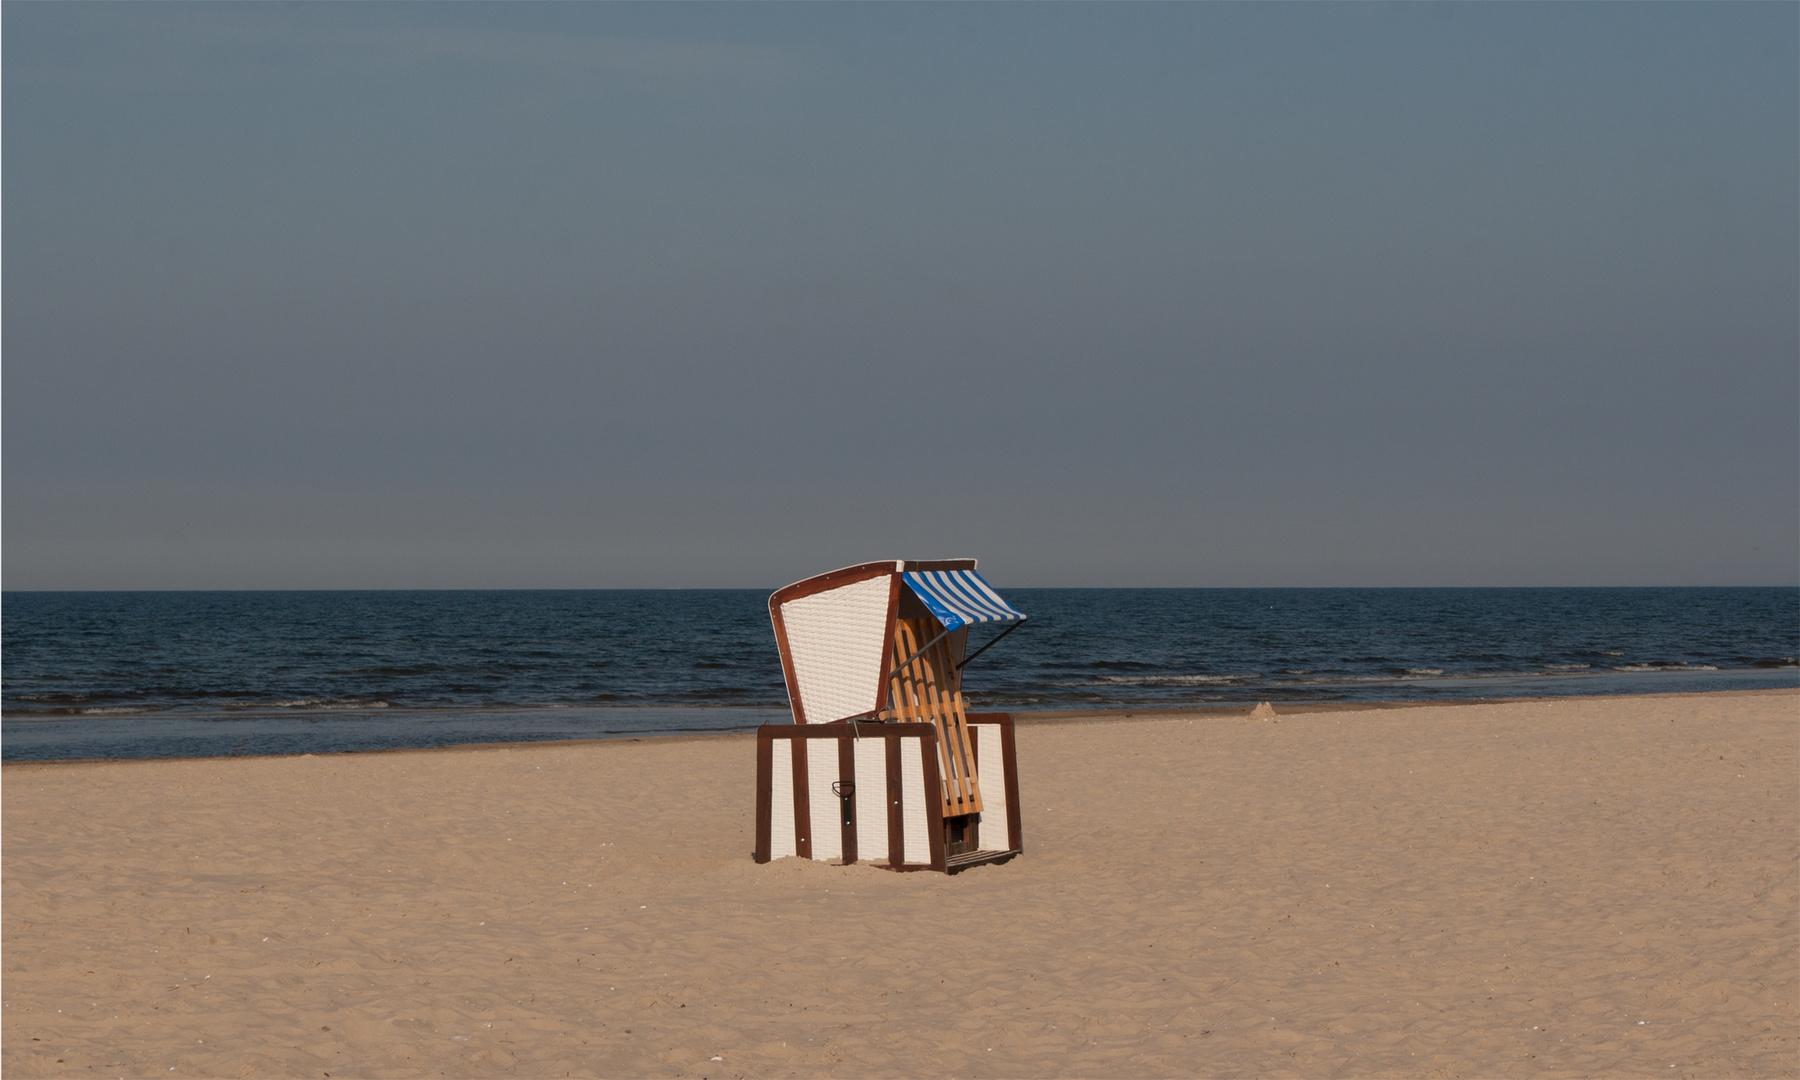 Strandimpressionen 1.0